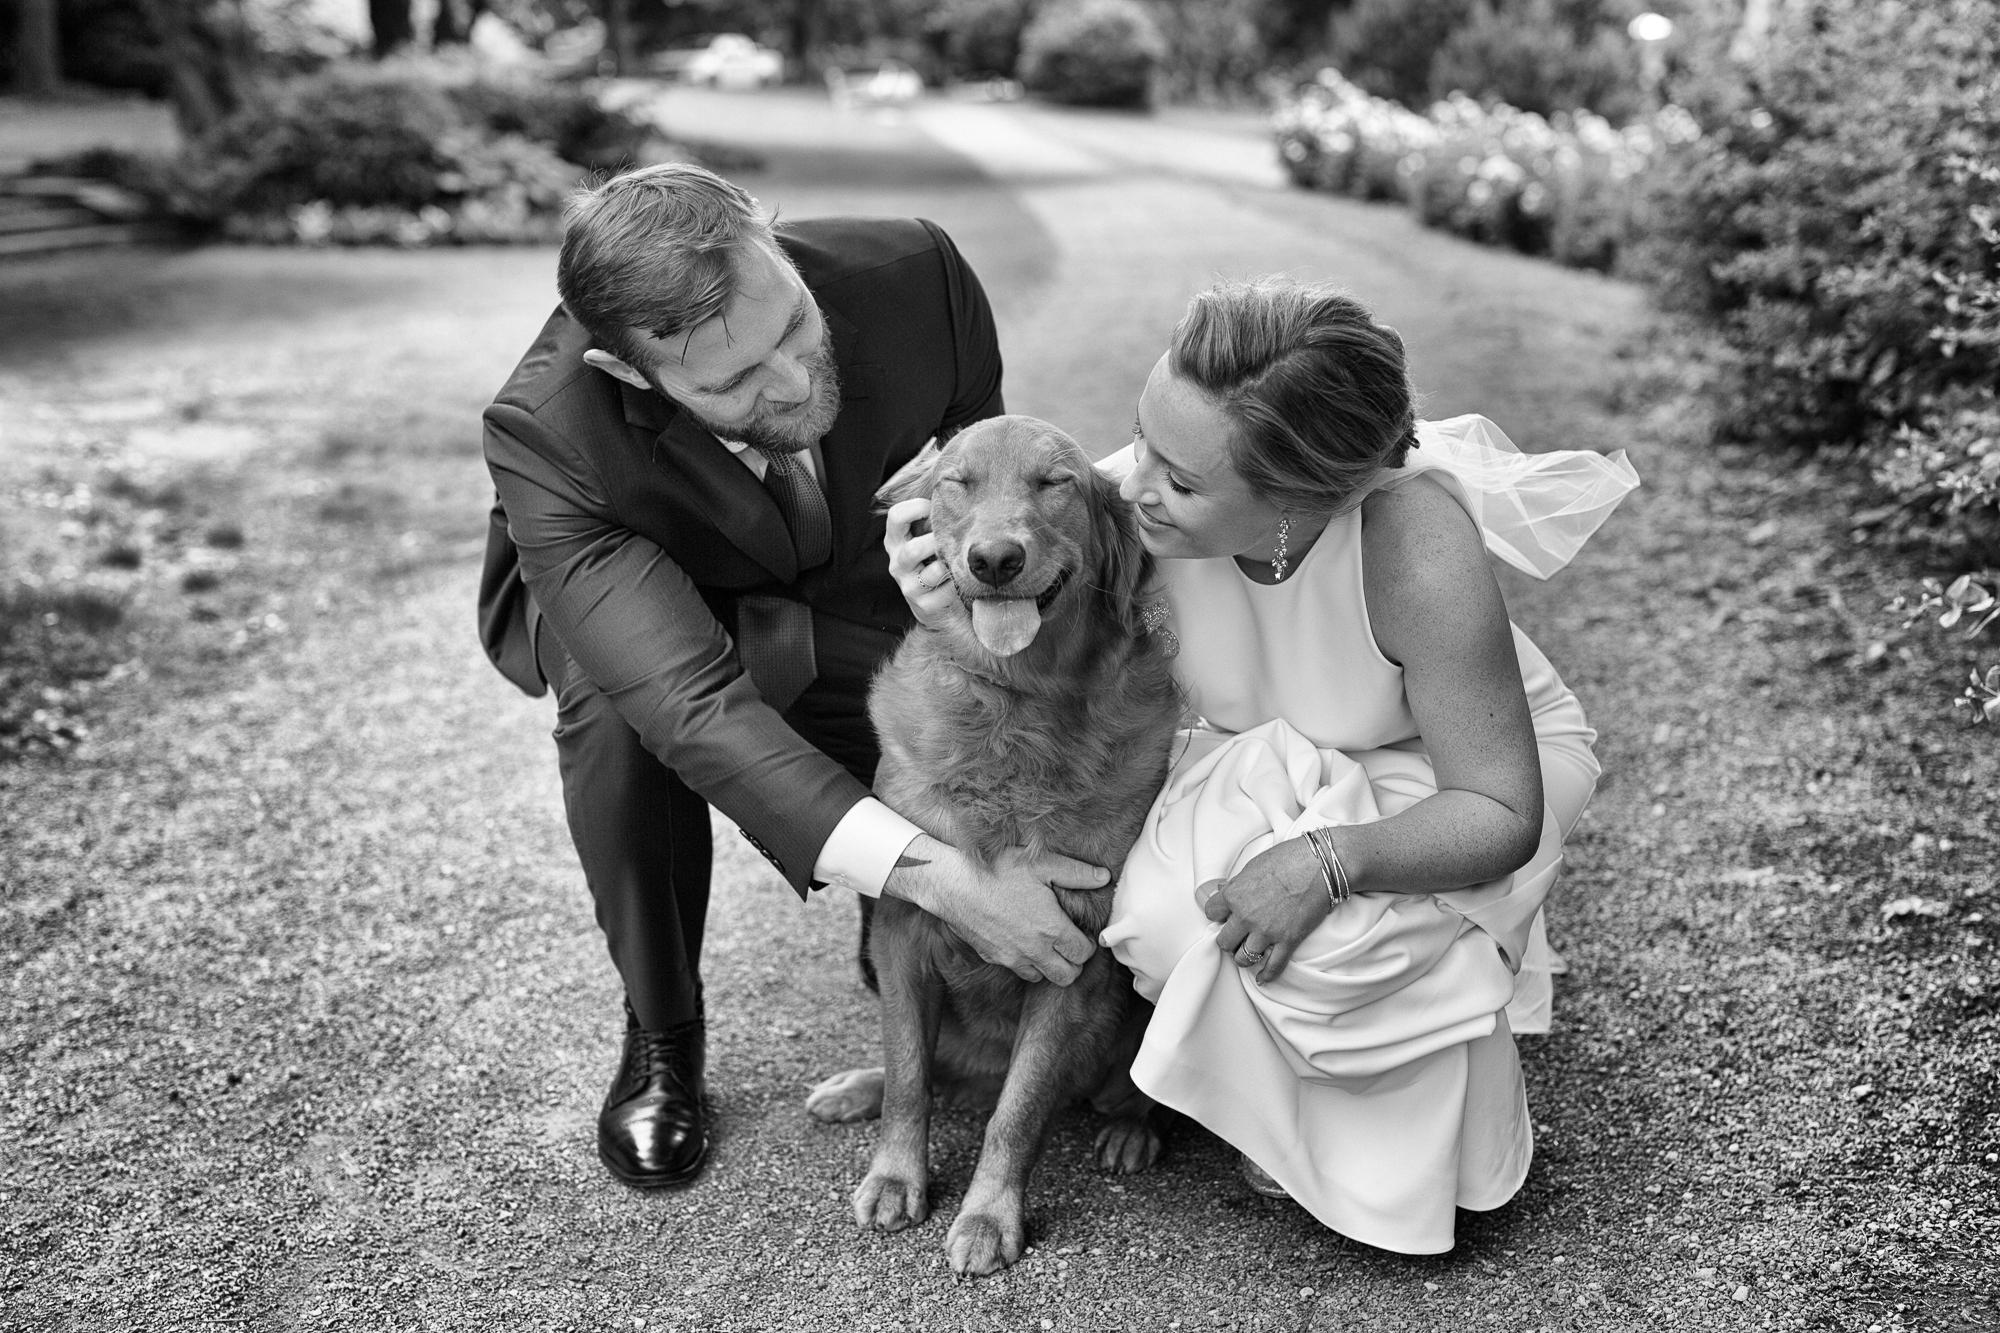 canlis restaurant wedding photos by Krista Welch-0018.jpg